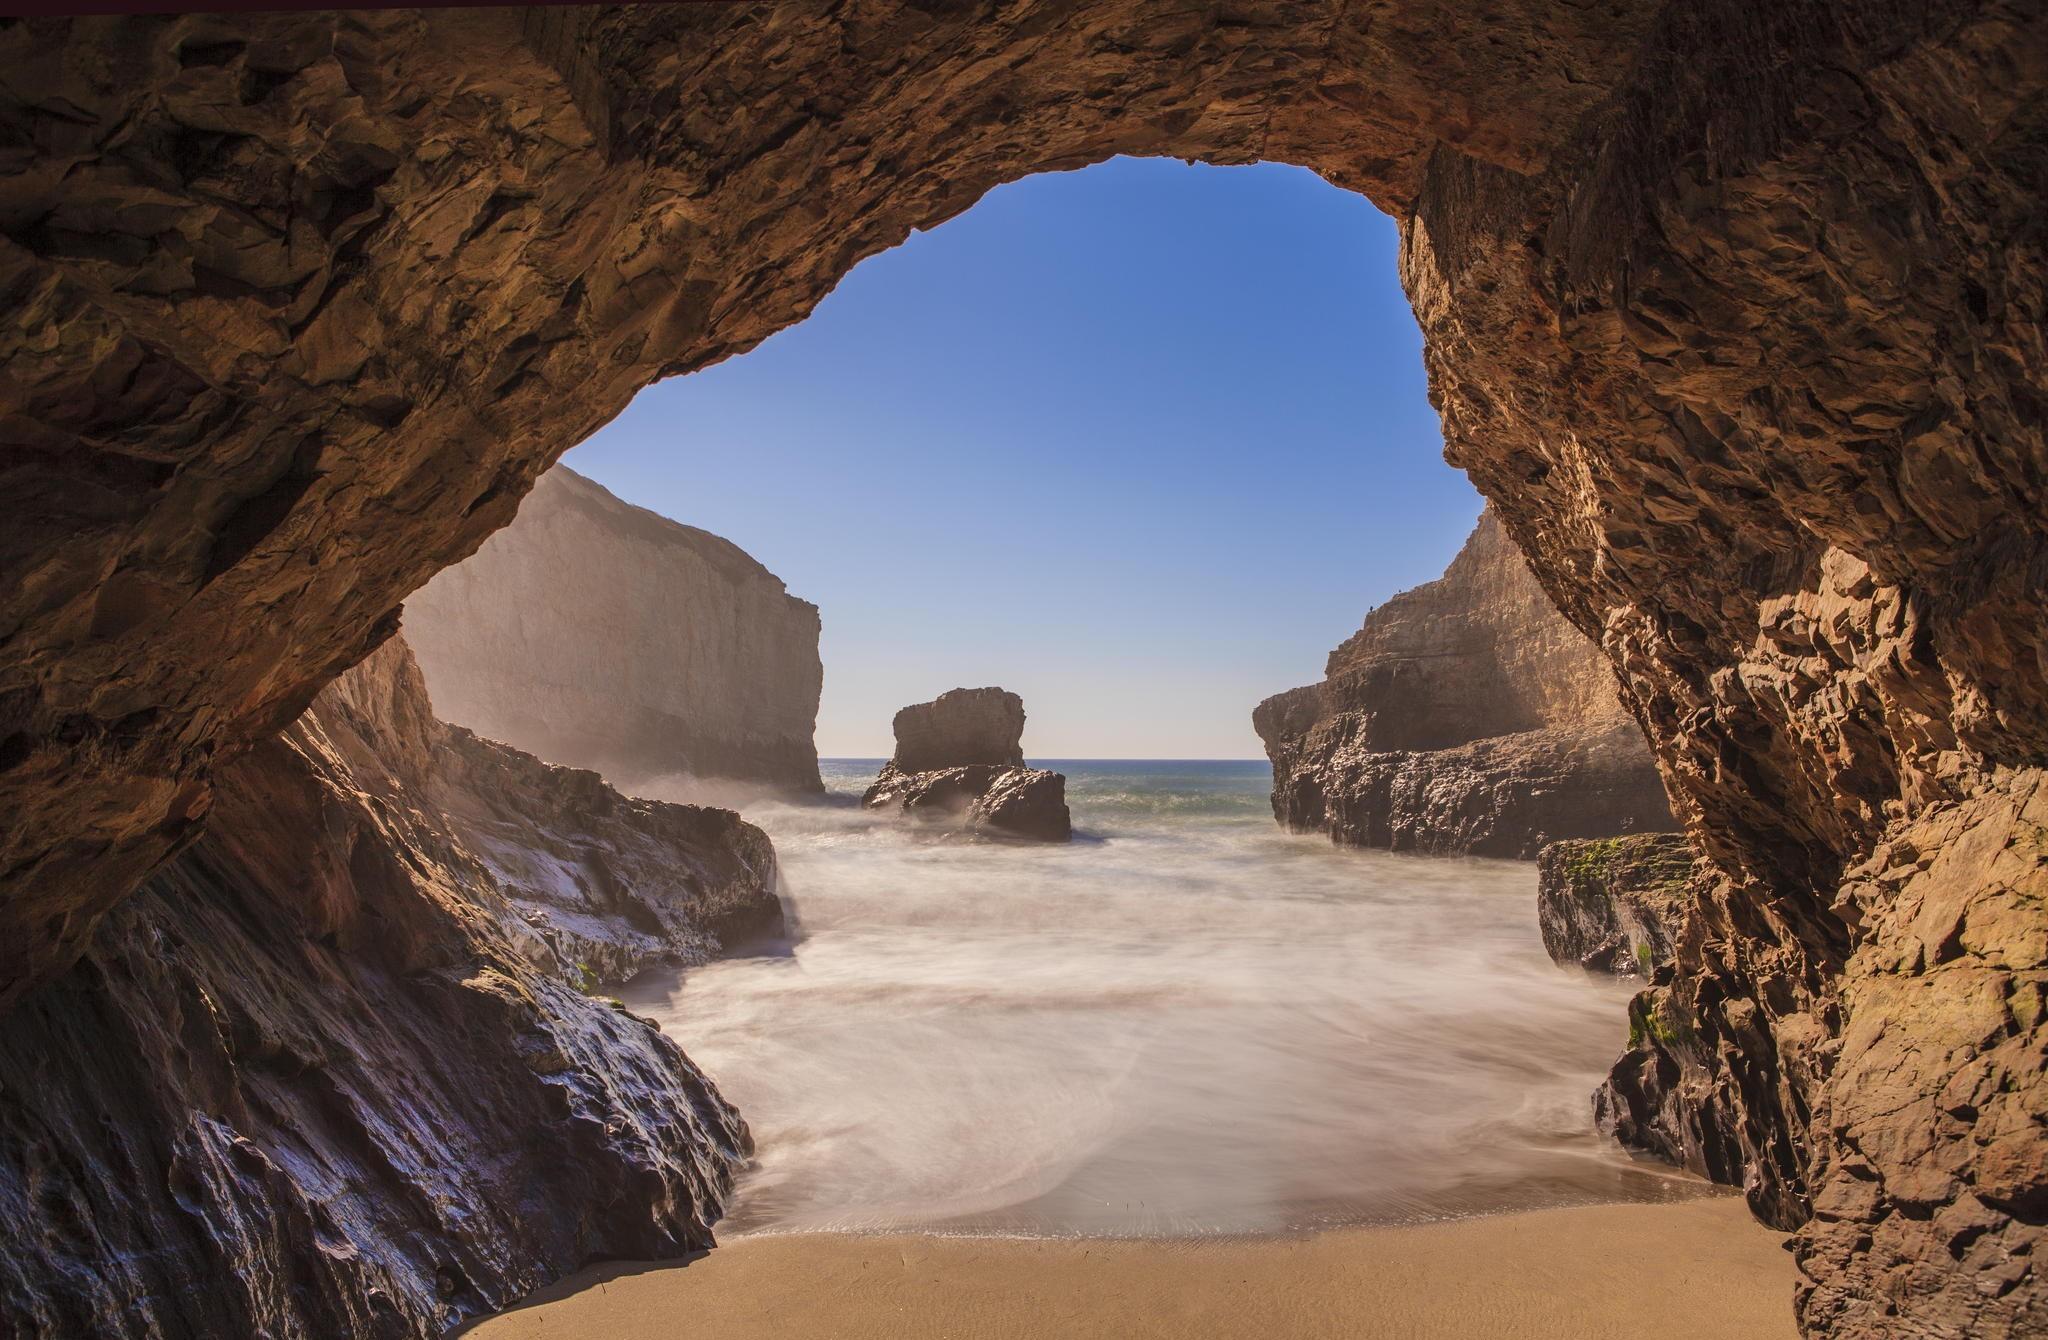 Iphone X Frame Wallpaper Grotte Fond D 233 Cran Hd Arri 232 Re Plan 2048x1340 Id